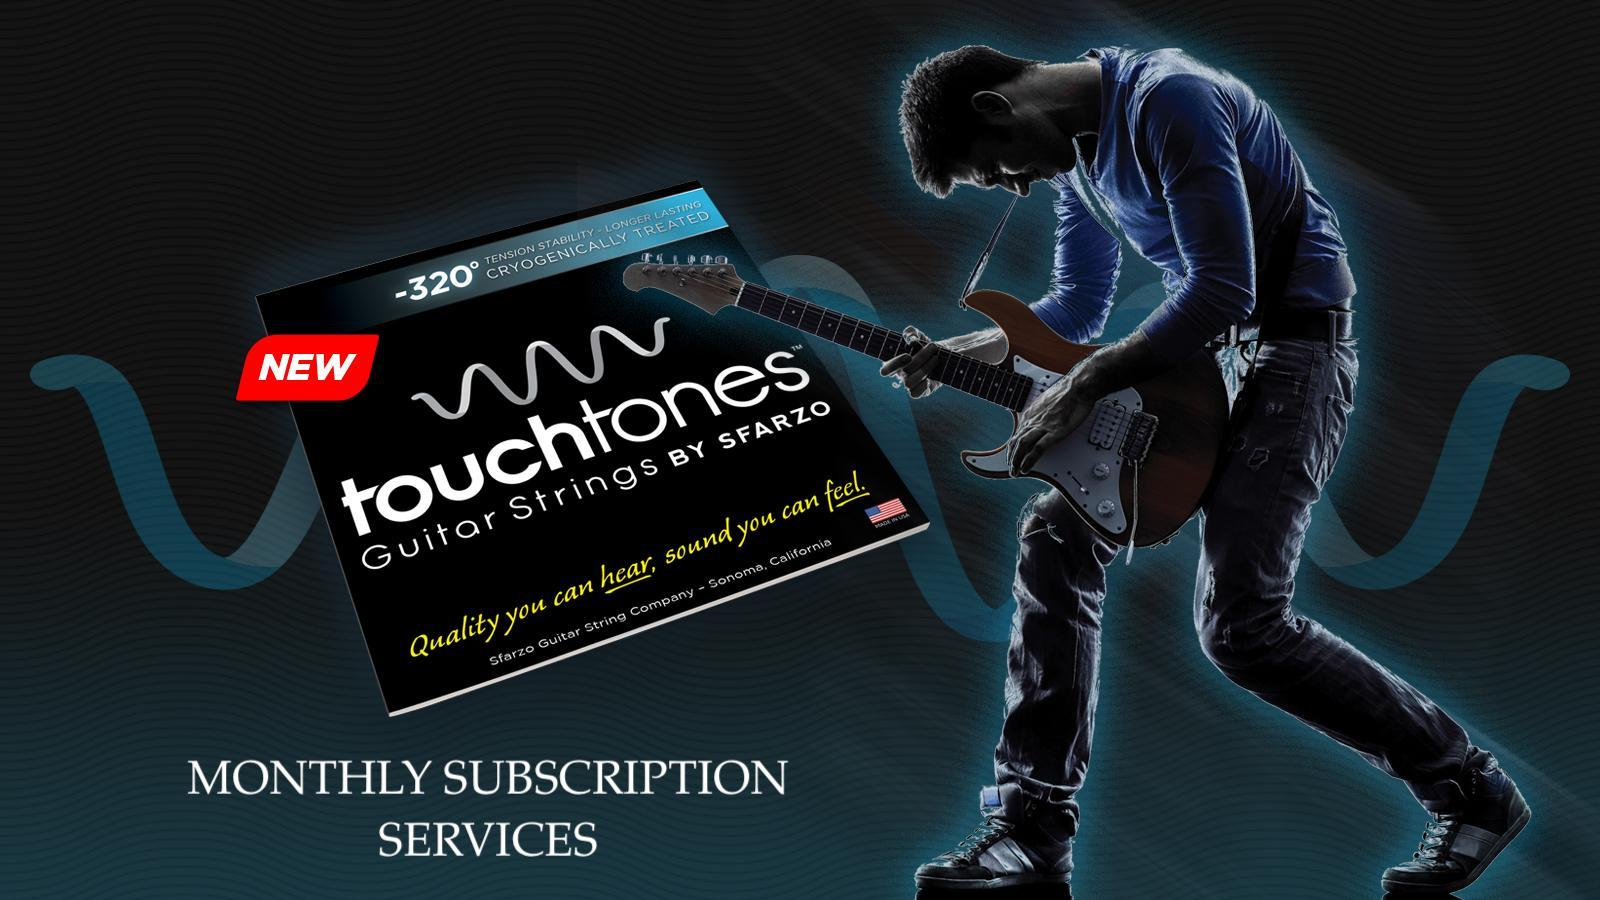 touchtones-subscription.jpg